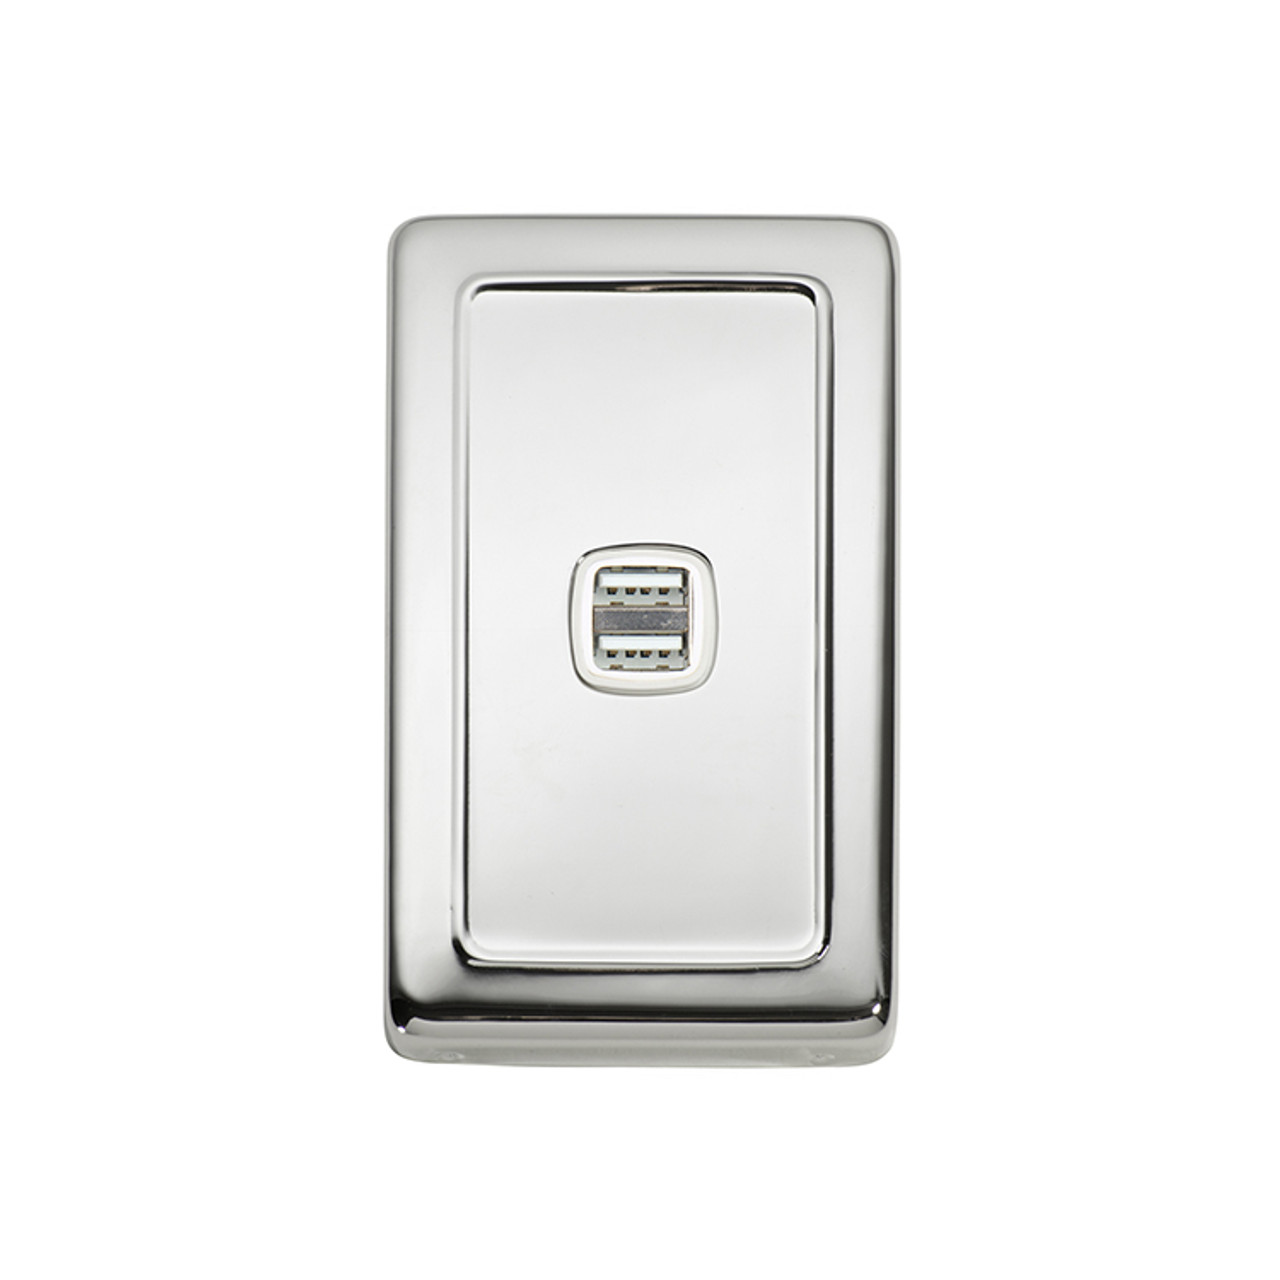 Polished Chrome USB Outlet Vertical Aspect